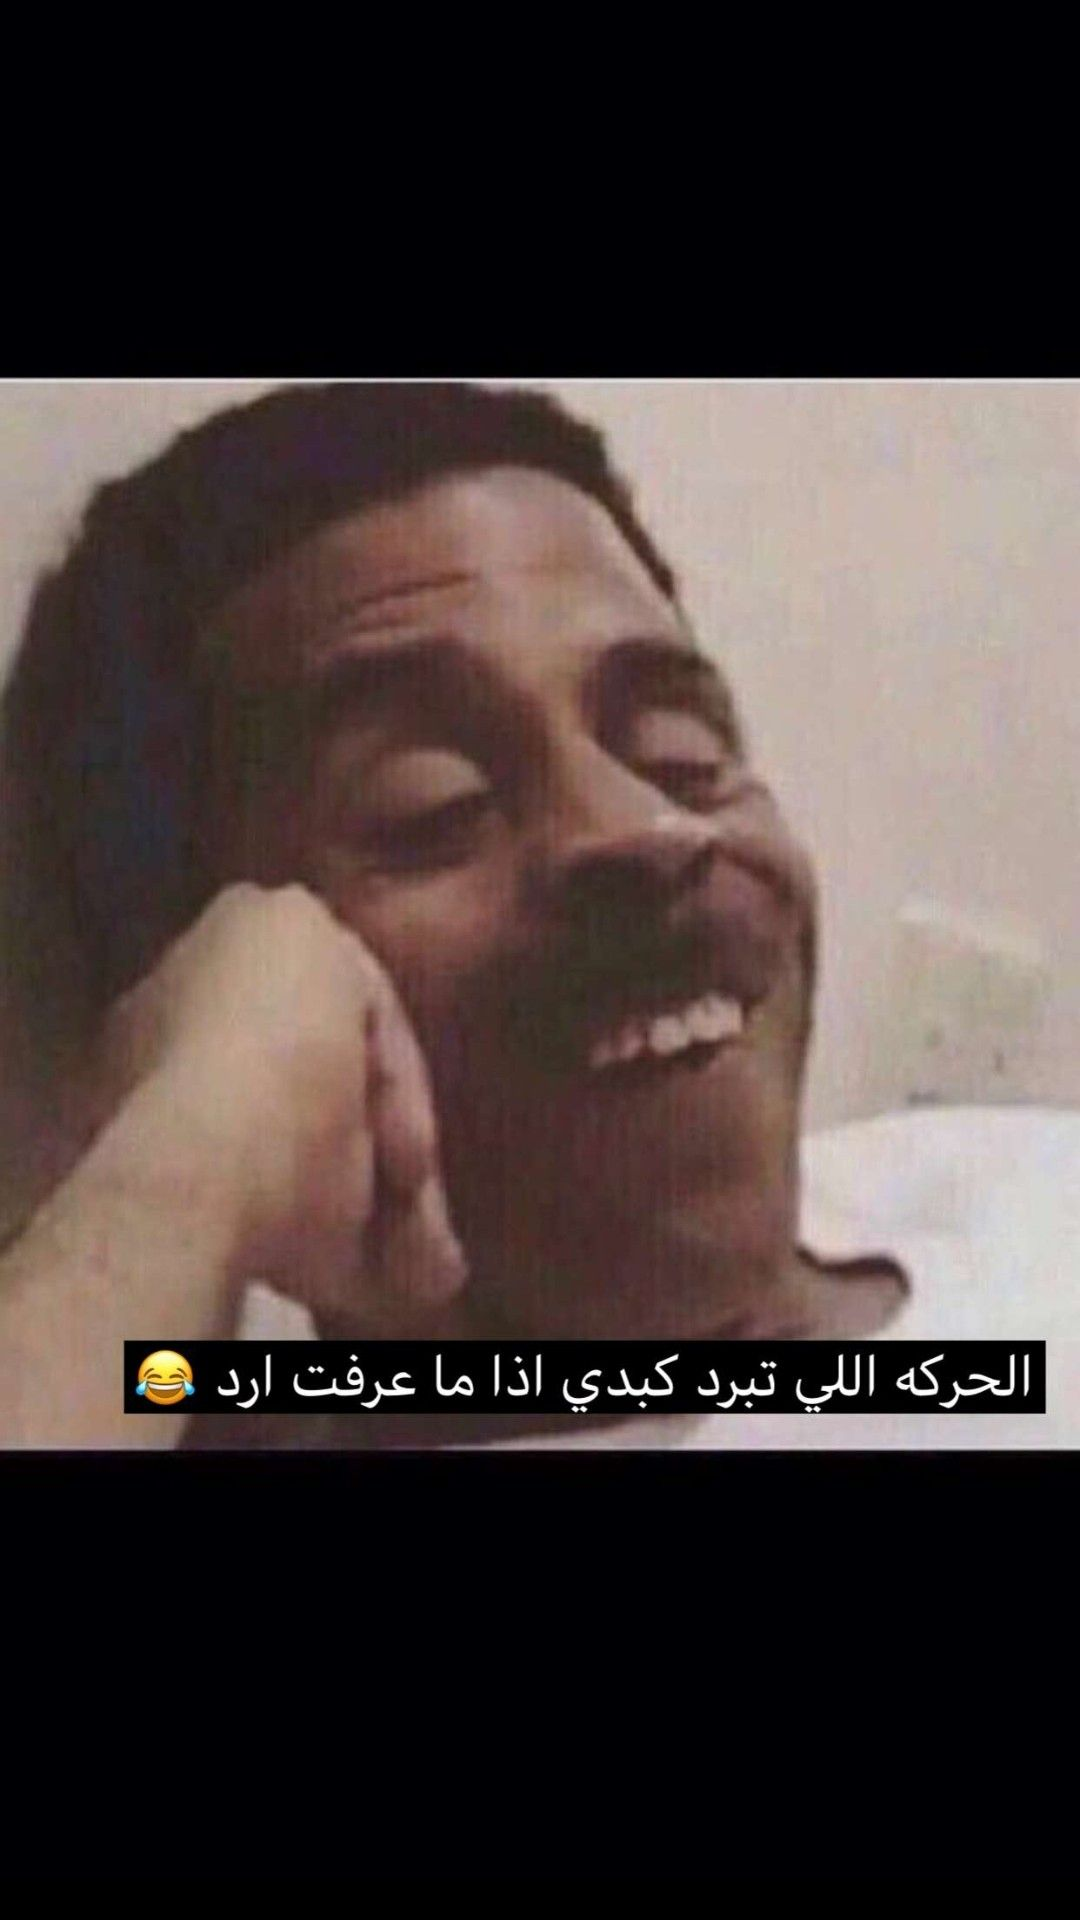 ﮪﮪﮪﮪﮪﮪﮪہہ اي والله Fun Quotes Funny Funny Arabic Quotes Jokes Quotes